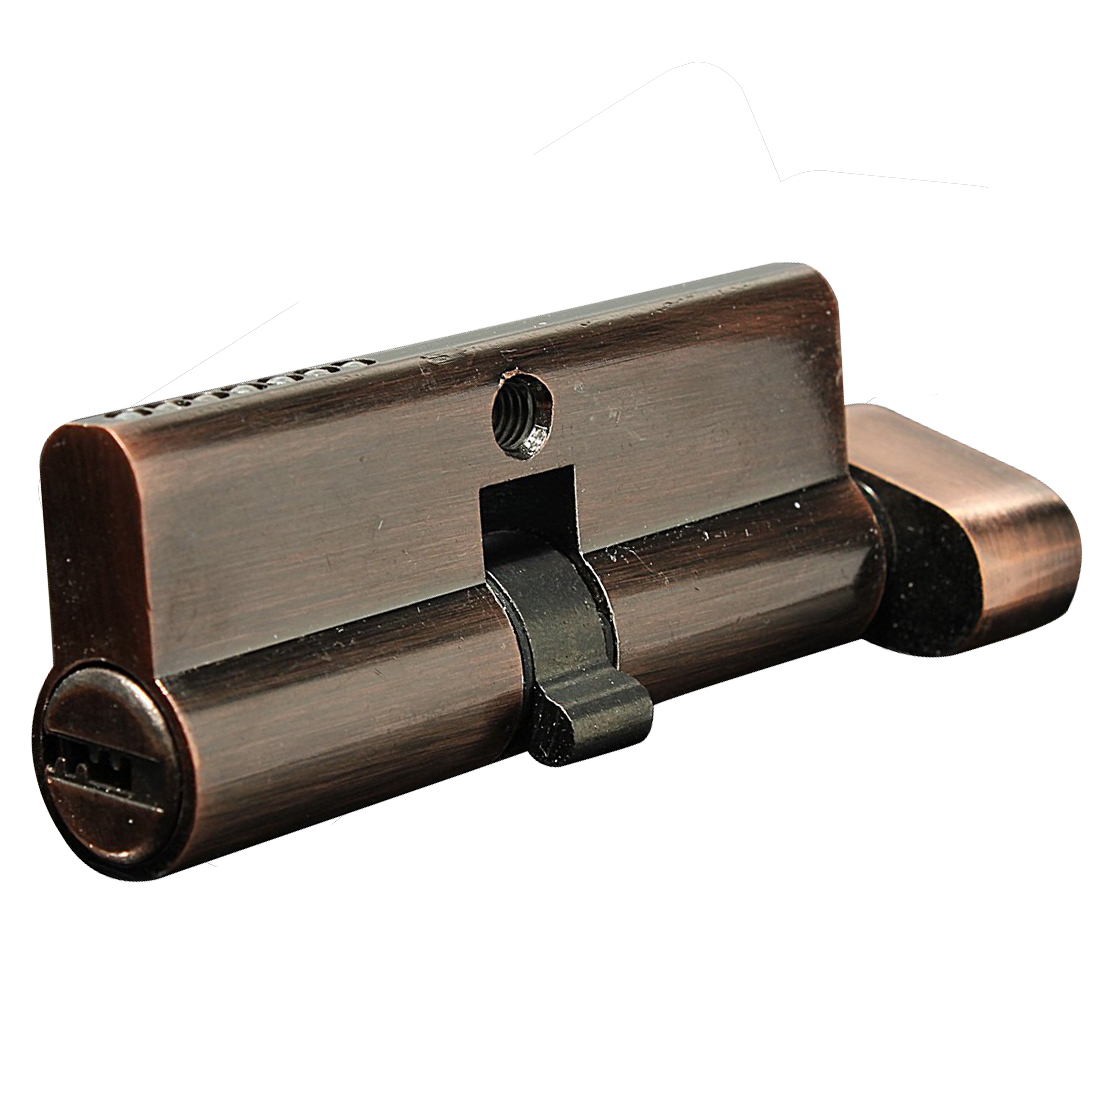 IMC Hot 70mm Hold Hand Locks Lock Cylinder Brass Lock Core Red copper